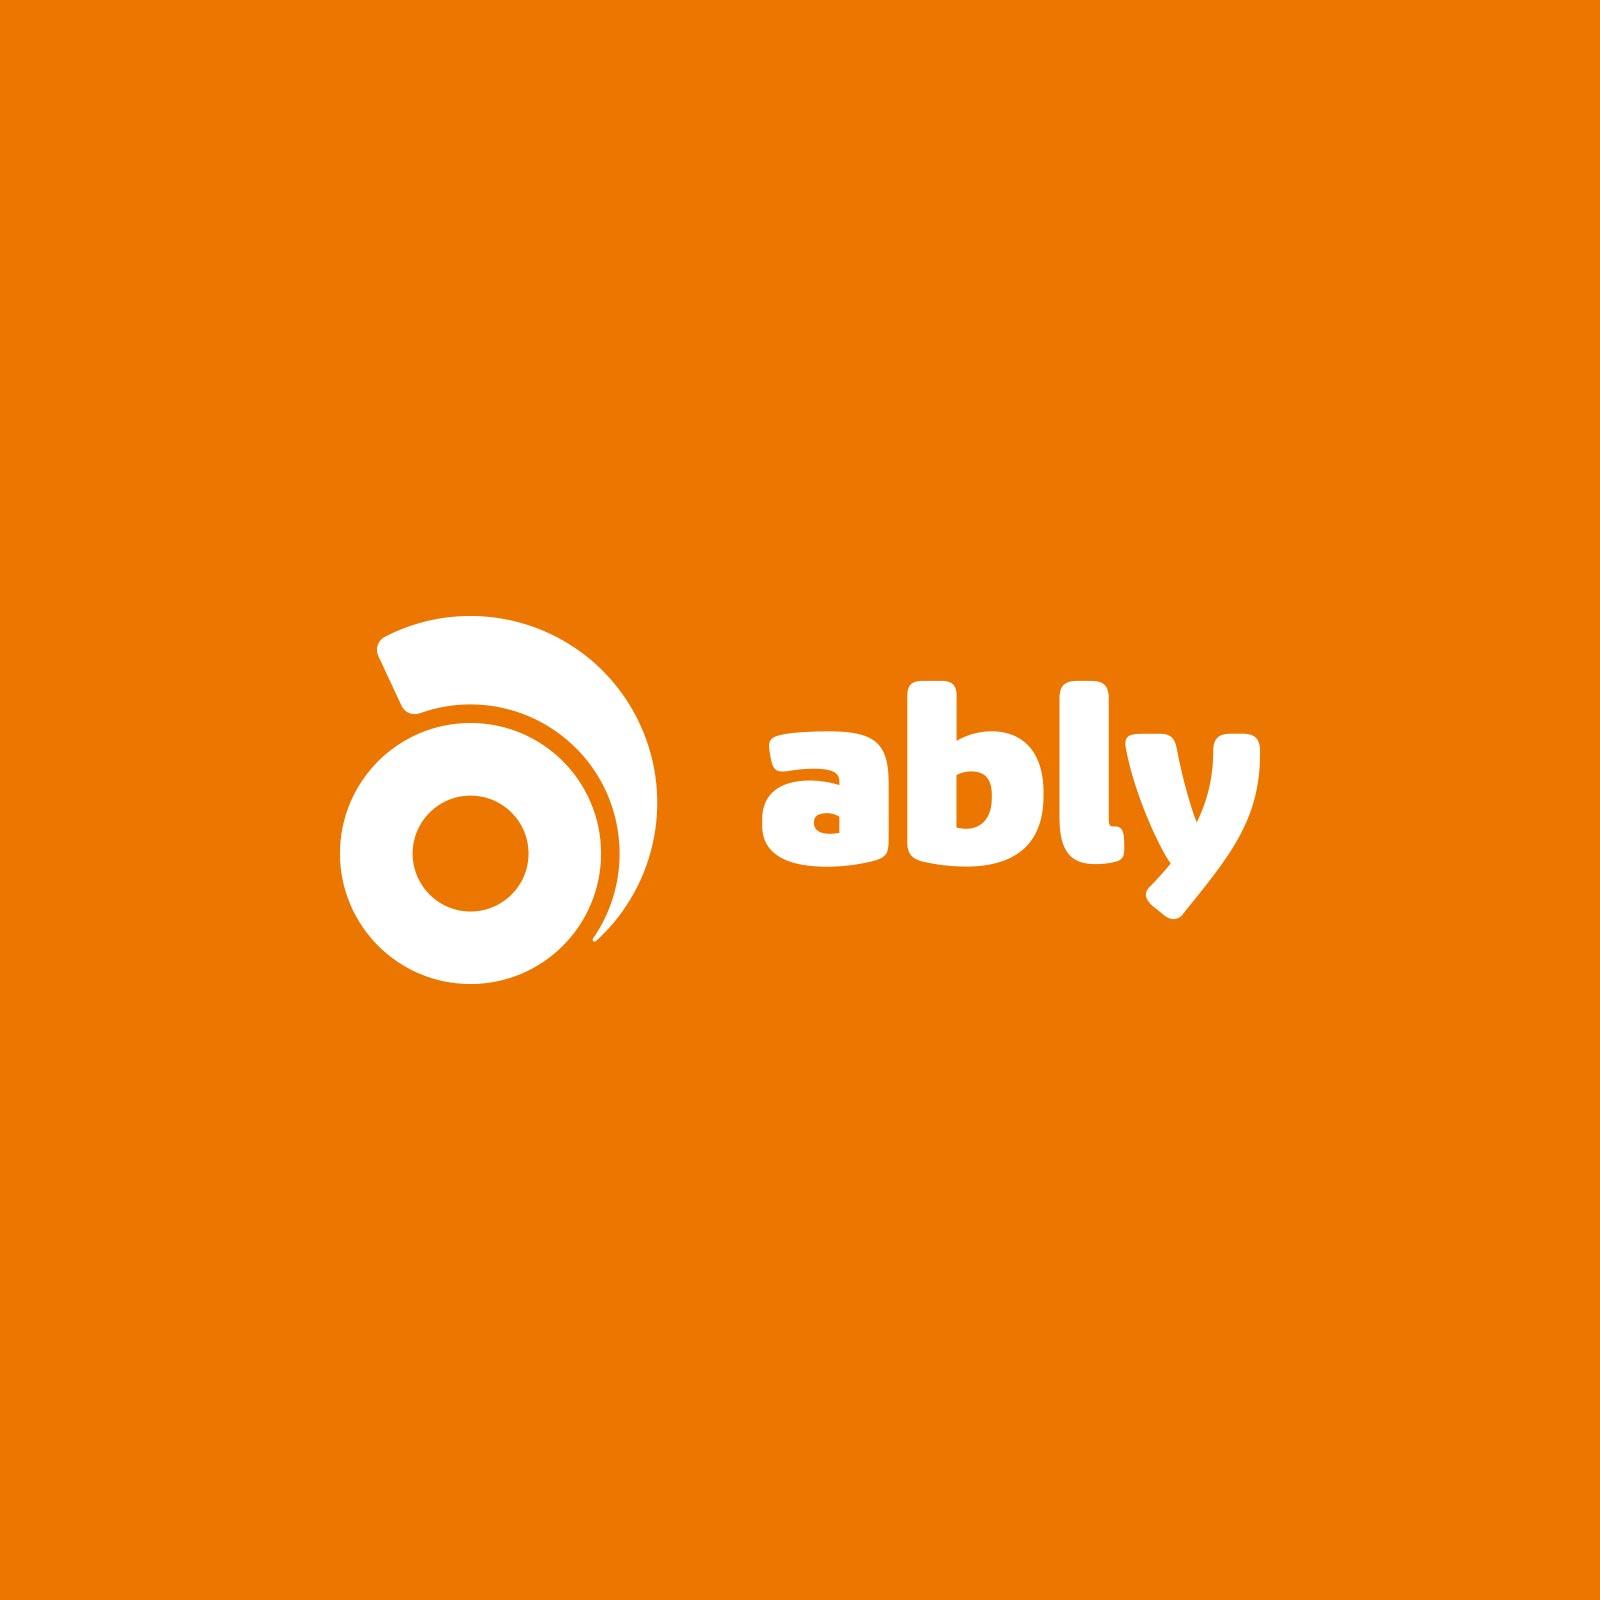 Ably_logo.jpg